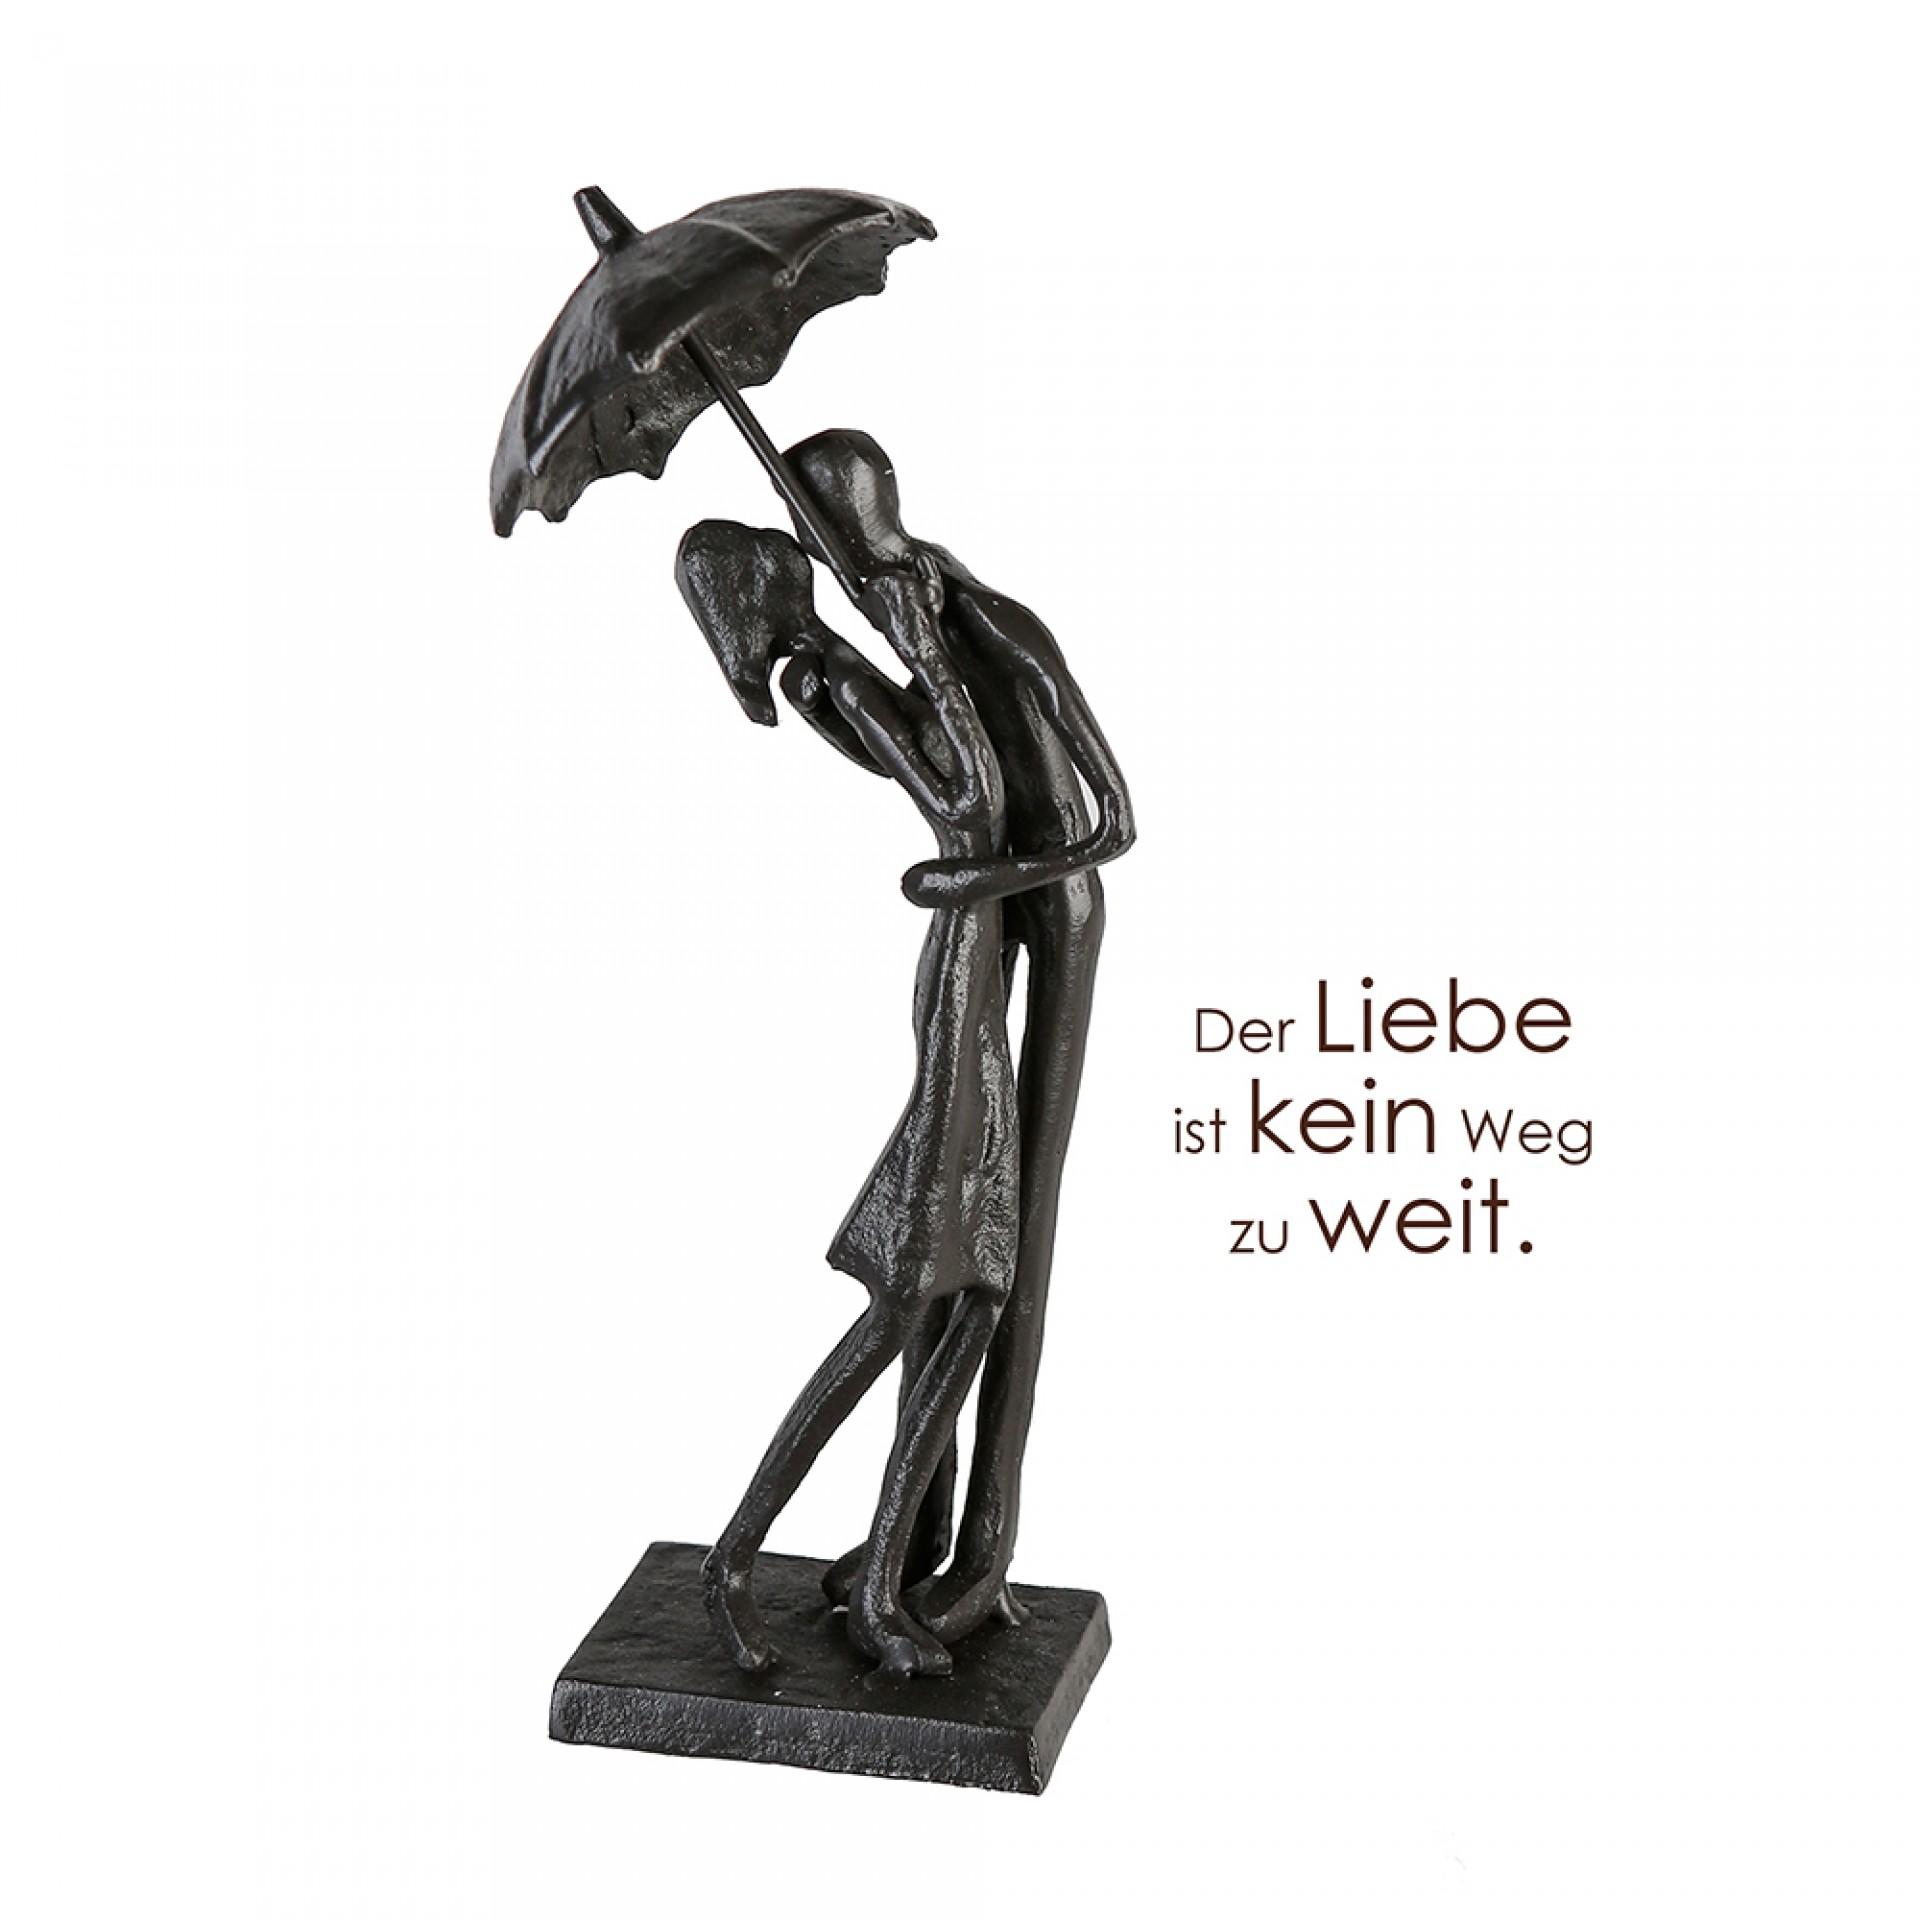 Historische Baustoffe Skulptur Statue Figur Liebespaar Liebe Paar Hochzeit Eisen Garten 65cm Onebitjr Com Br